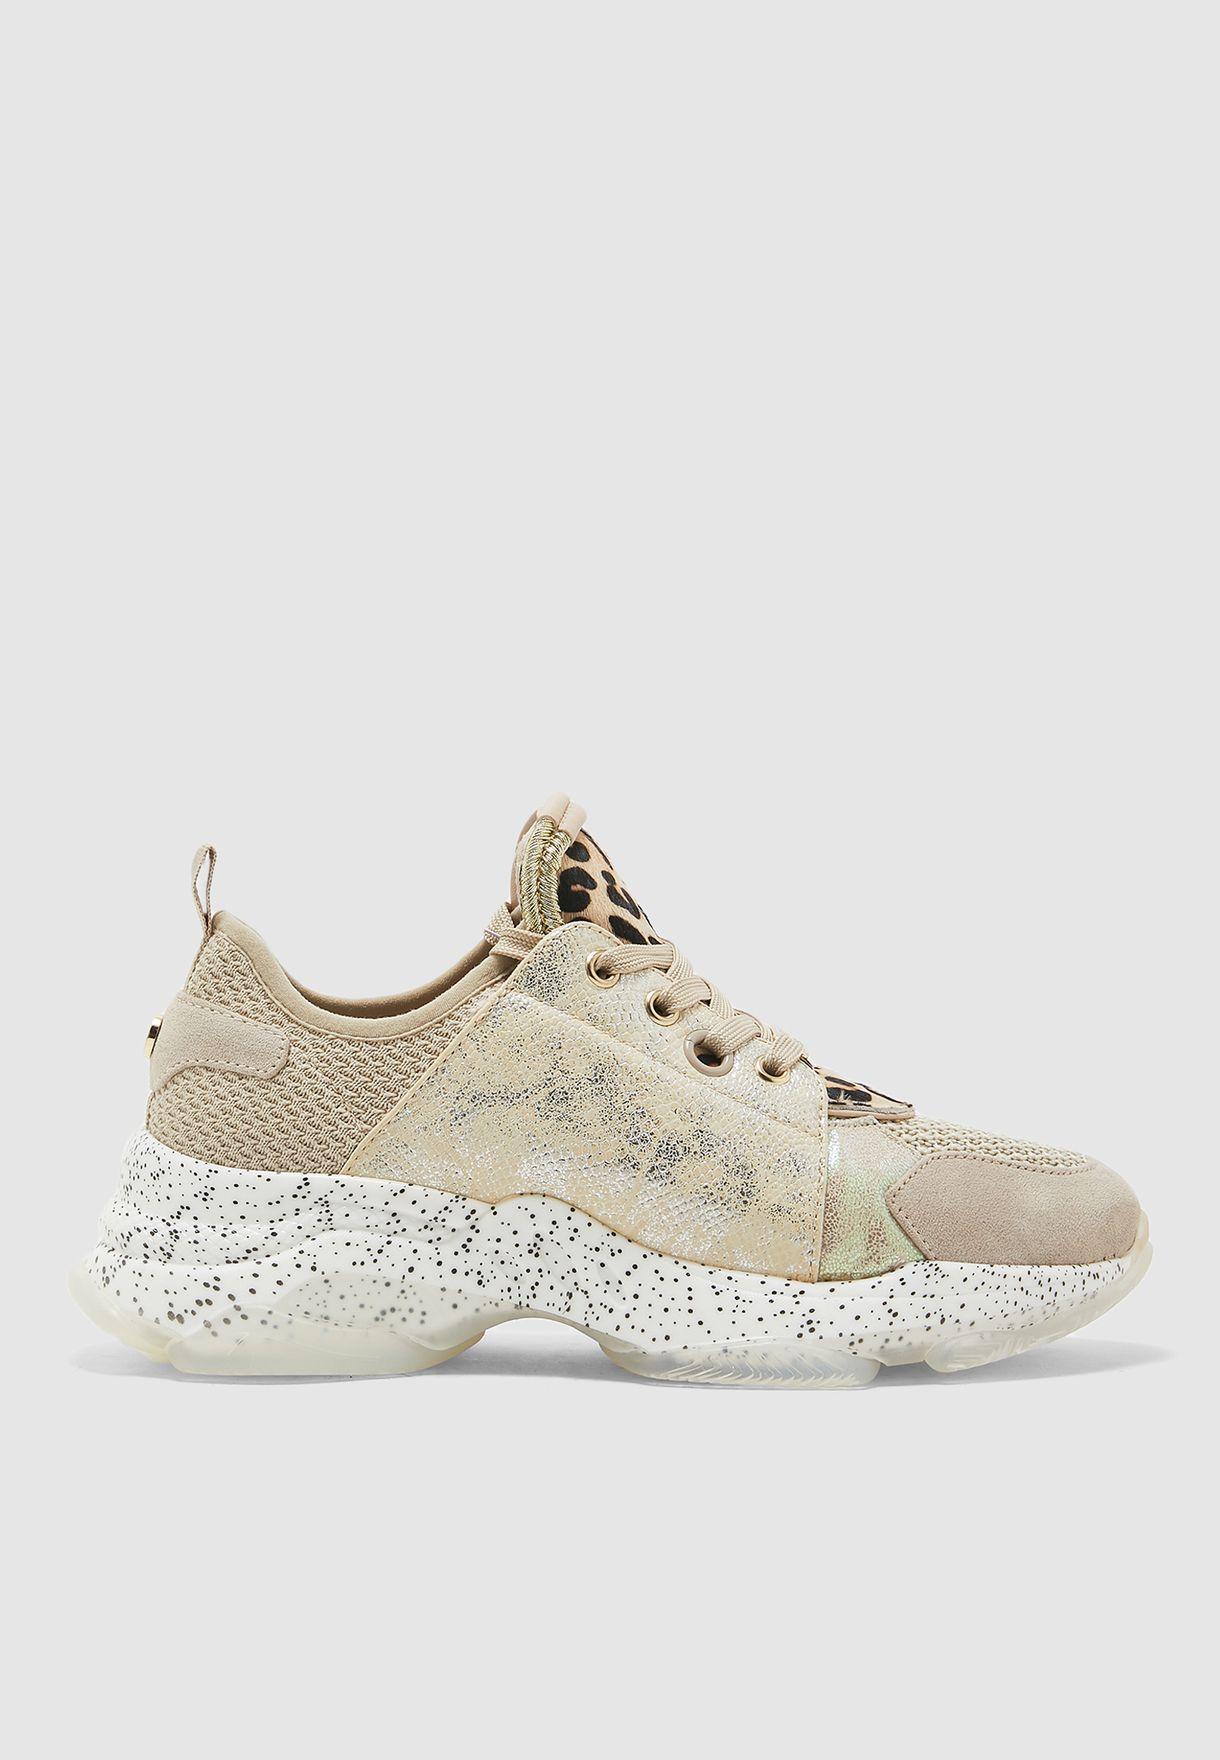 Mescal Low Top Sneaker - Grey